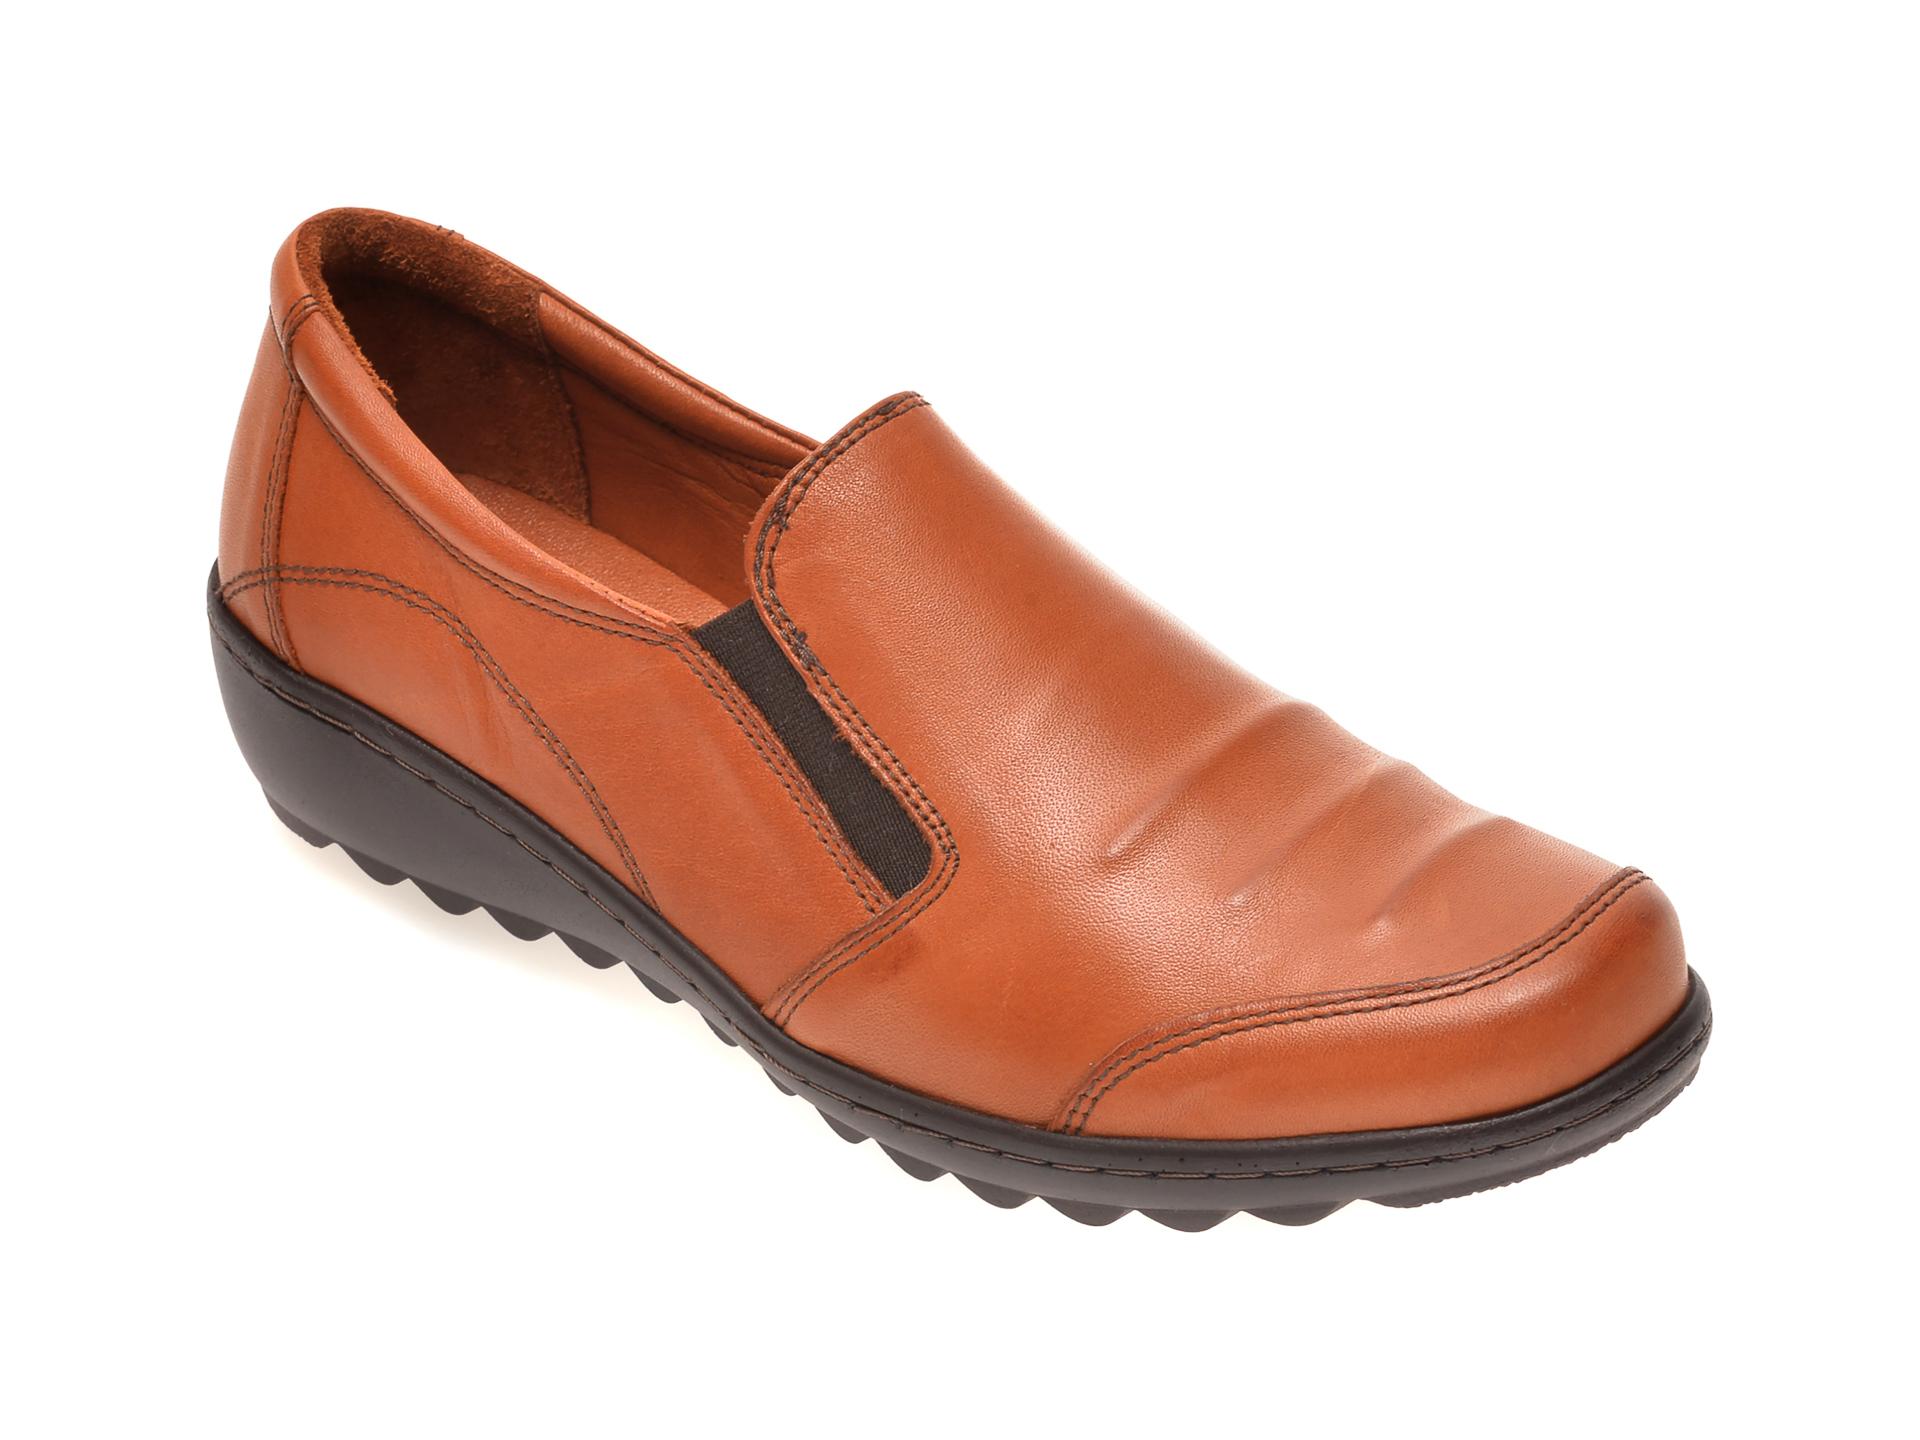 Pantofi PASS COLLECTION maro, 15115, din piele naturala imagine